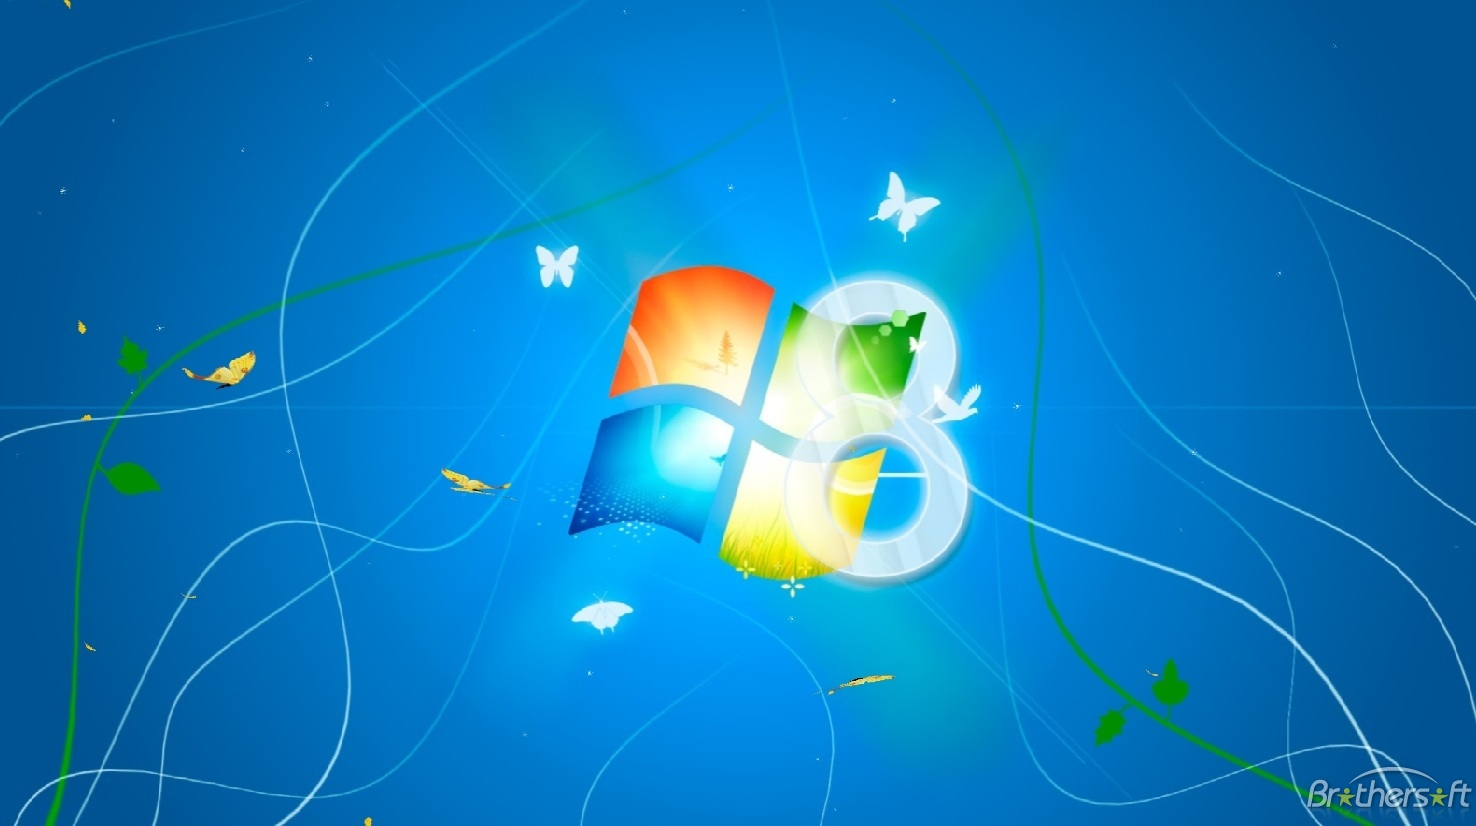 Windows 8 Light Animated Wallpaper Windows 8 Light Animated 1476x826